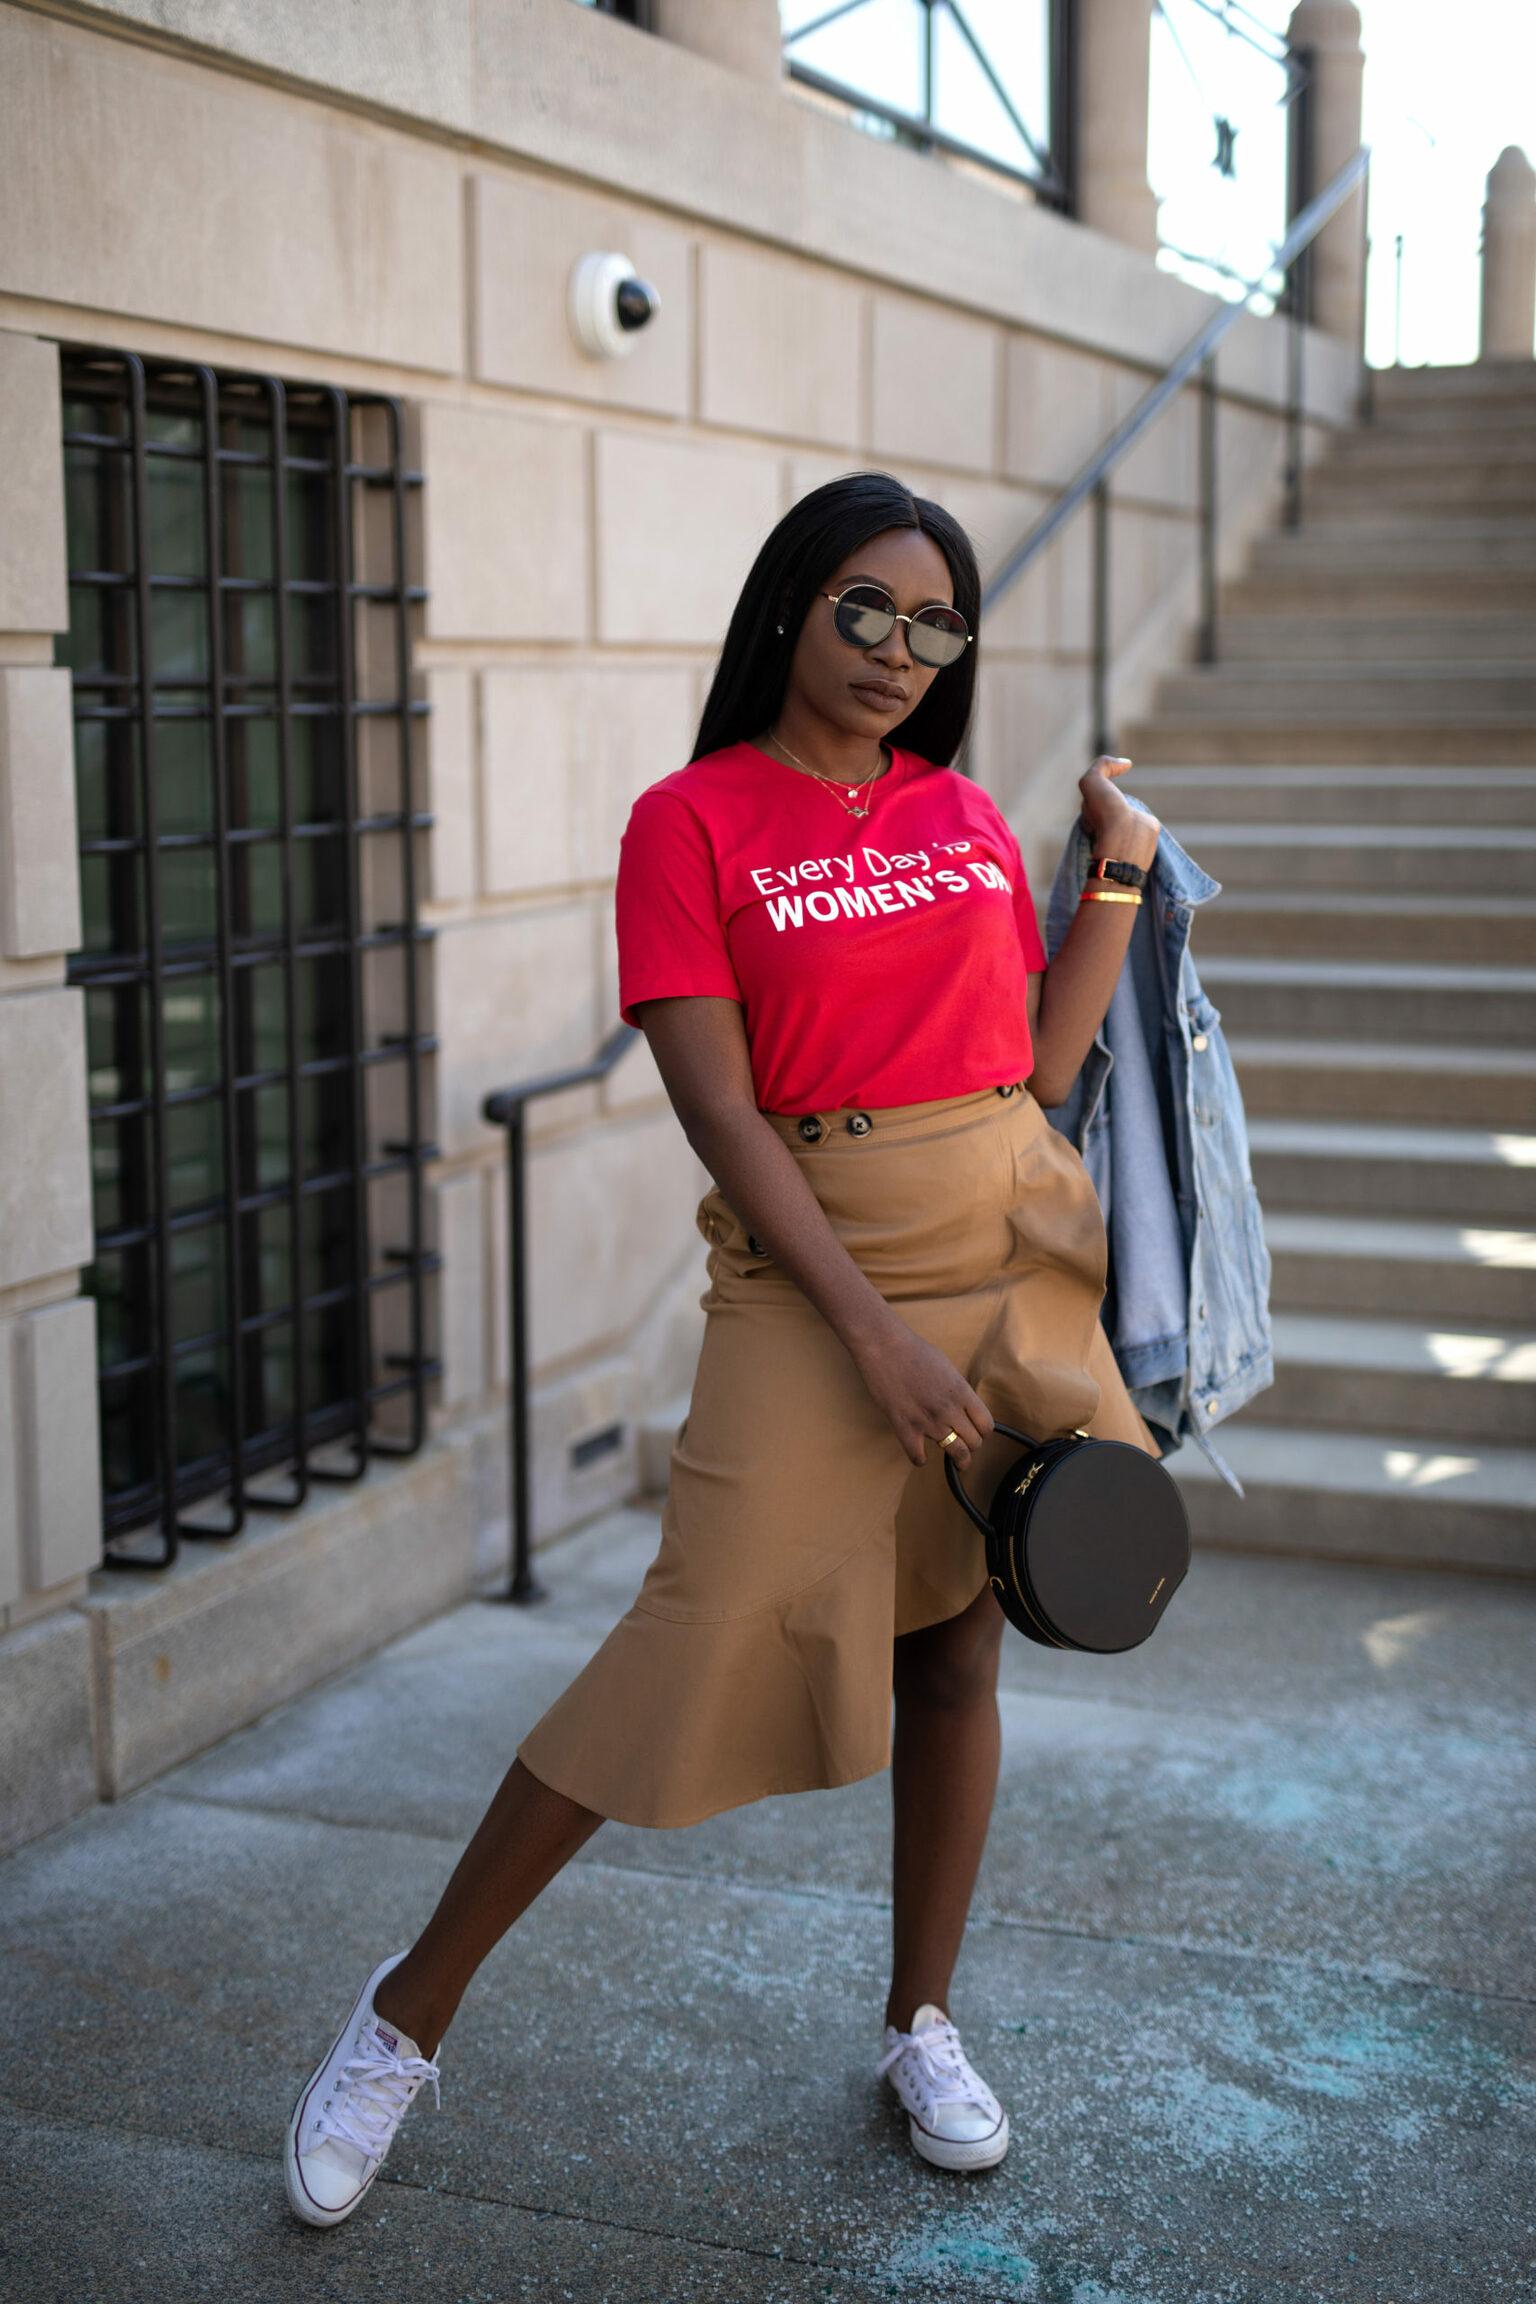 East Coast Charm: Our Top 10 Connecticut Fashion Bloggers